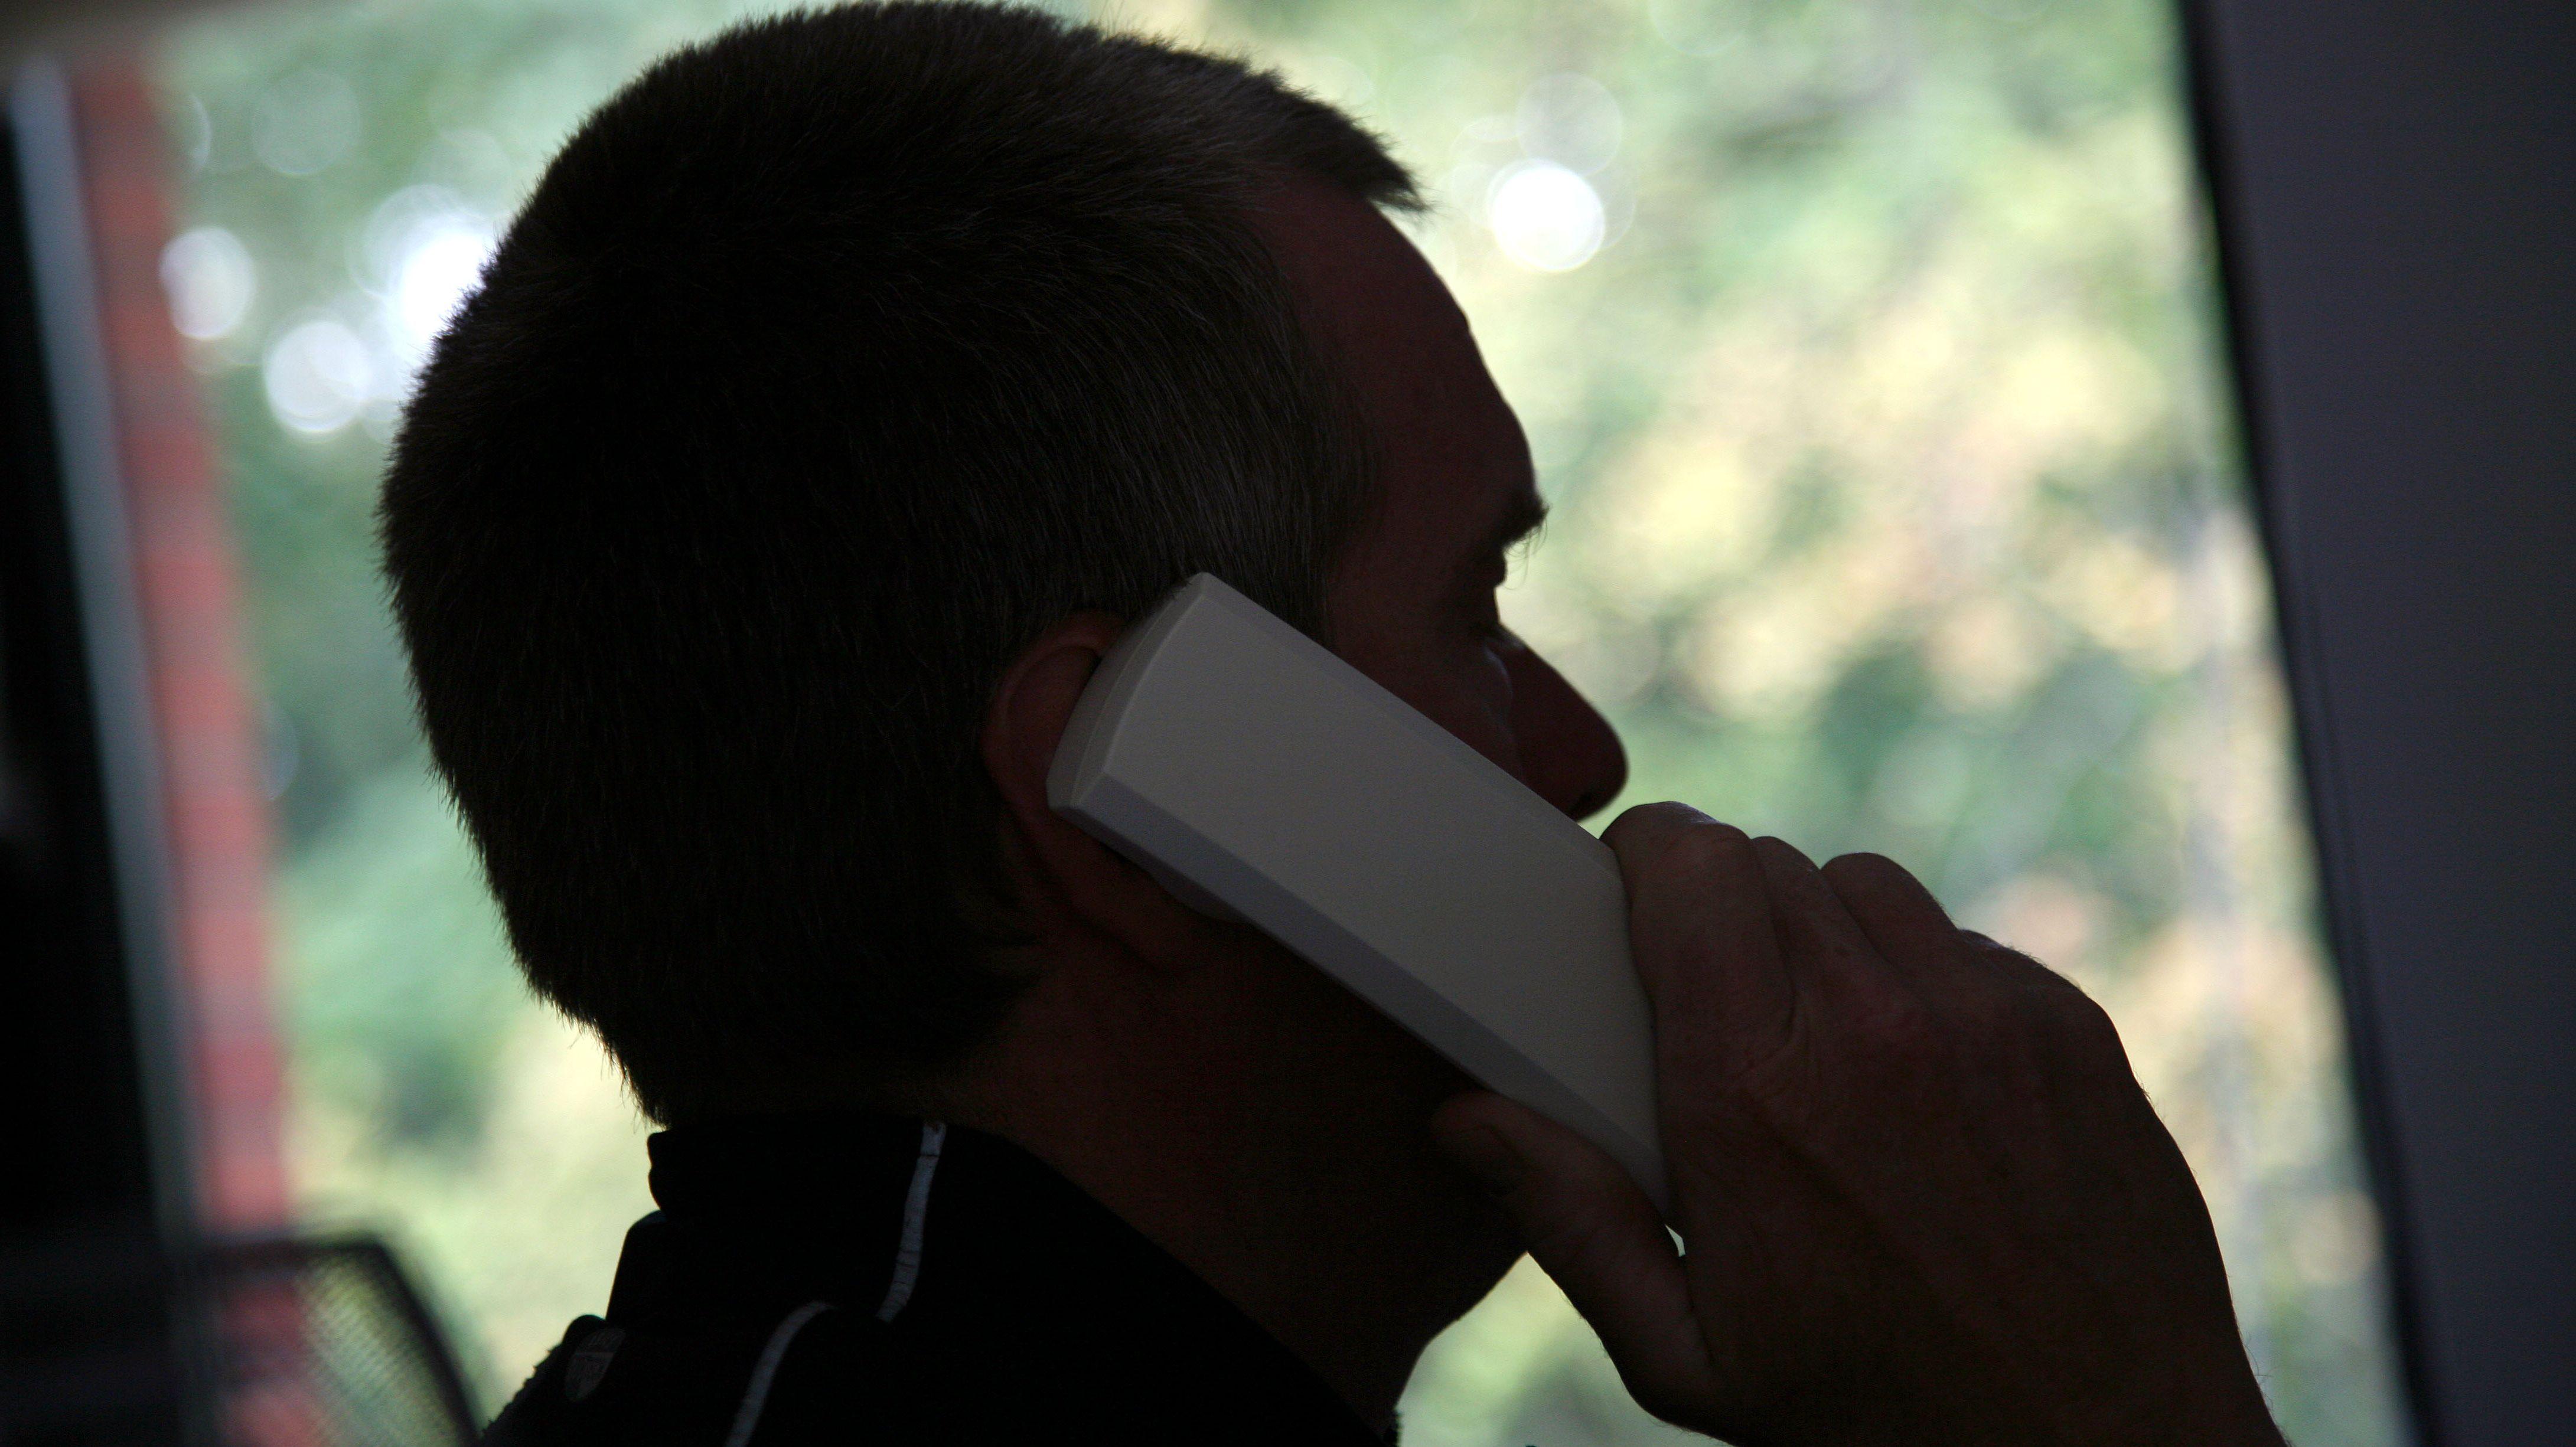 Mann am Telefon (Symbolbild)